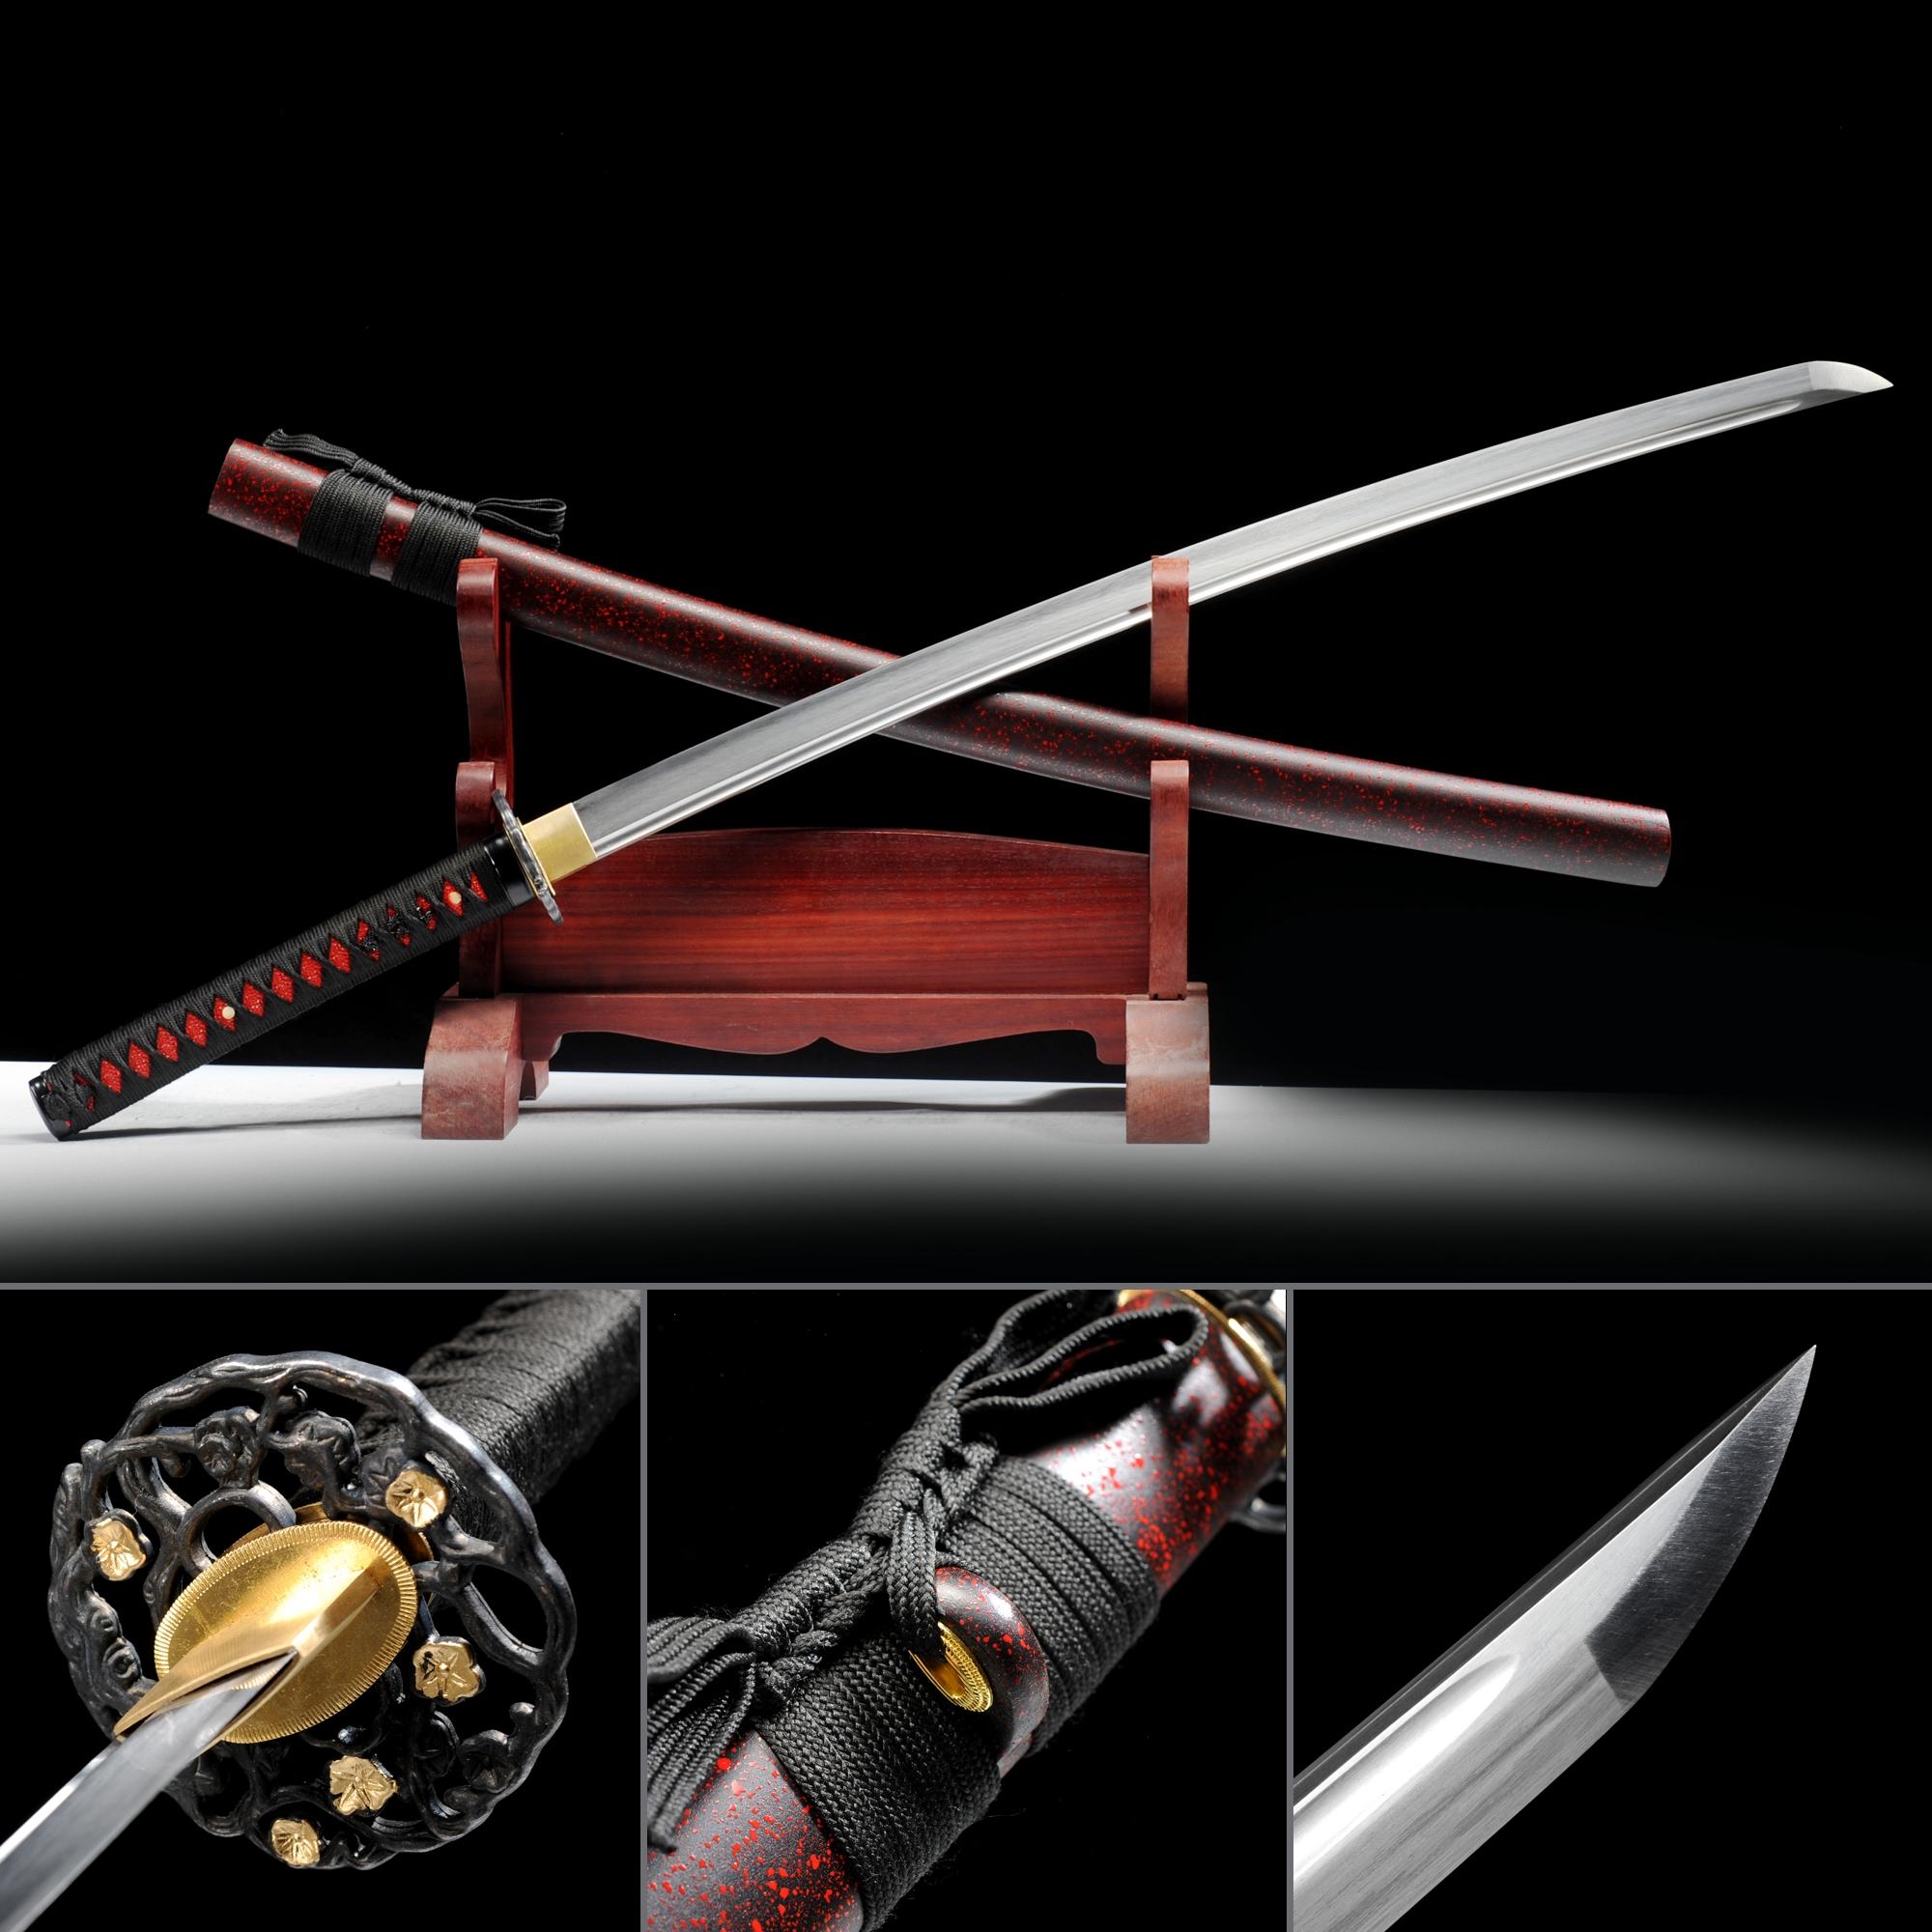 Black And Red Katana, Handmade Japanese Samurai Sword High Manganese Steel With Dark Red Scabbard